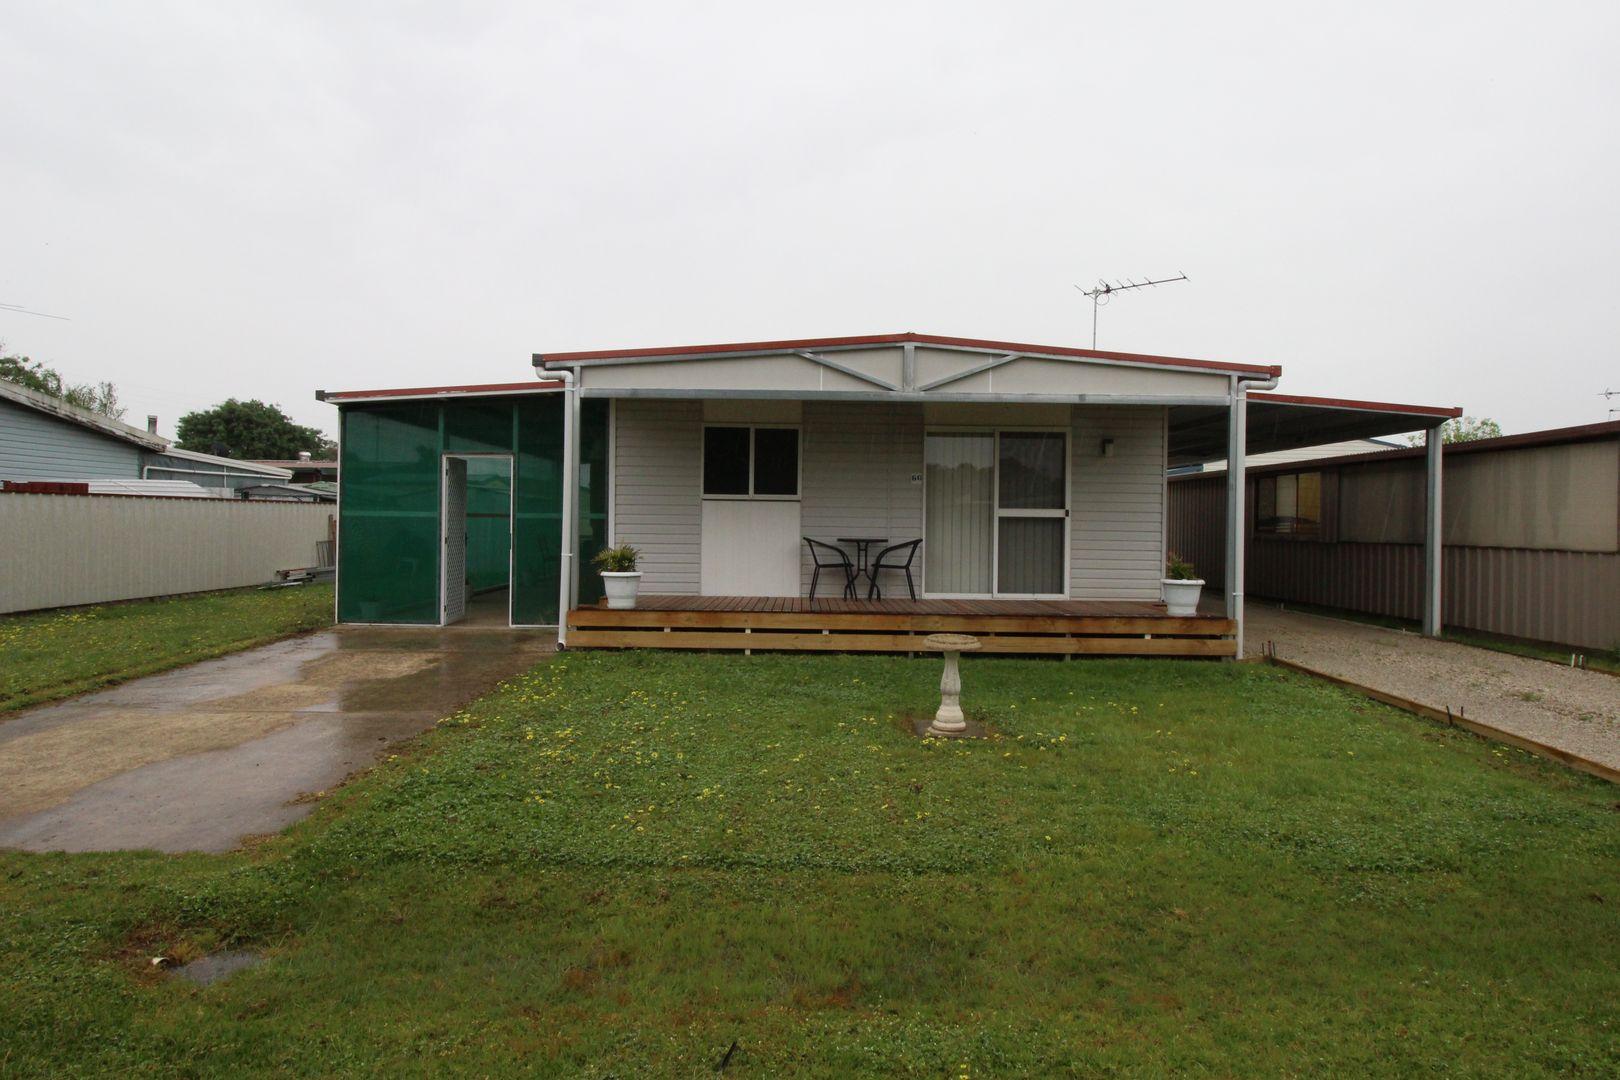 66/5189 Riverina Highway, Howlong NSW 2643, Image 0